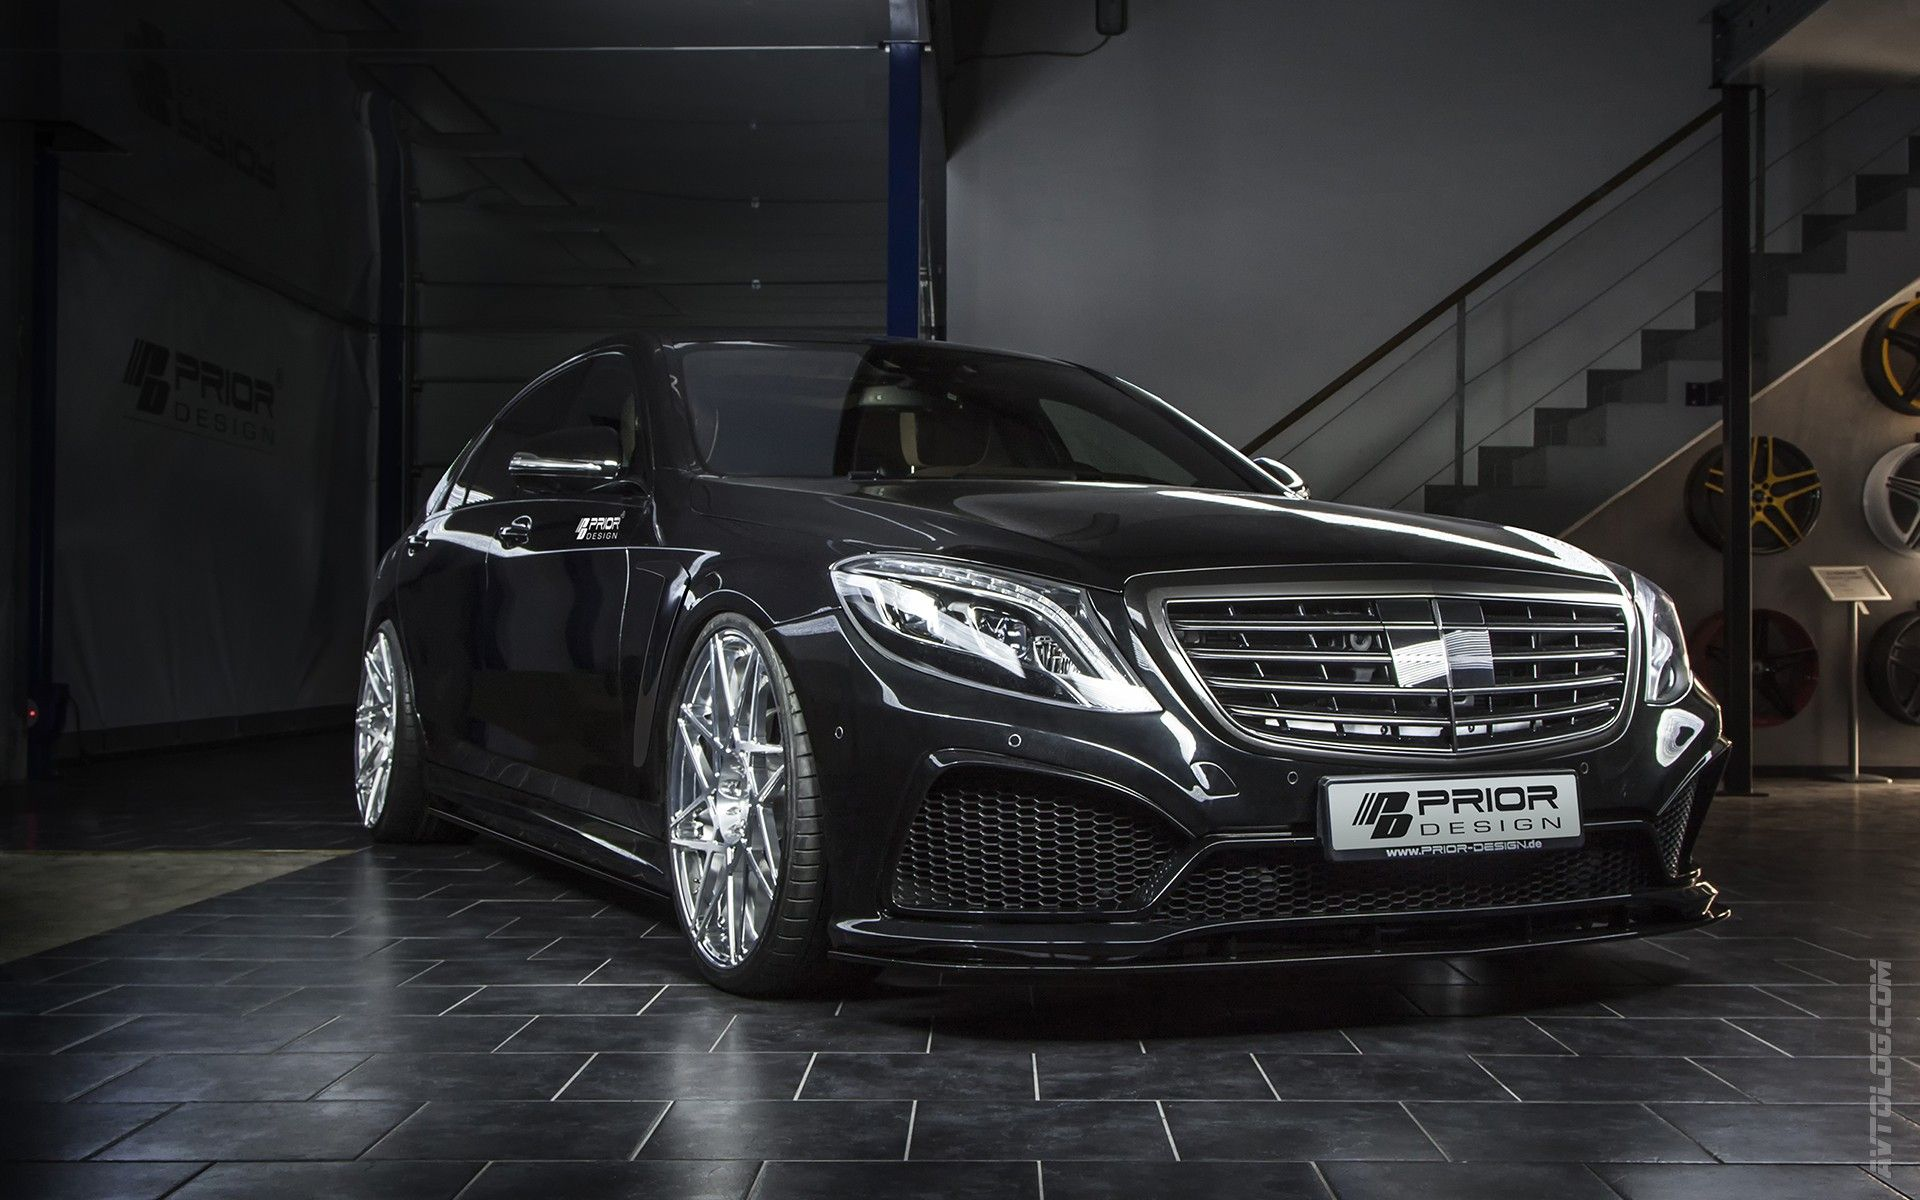 2014 Prior Design Mercedes-Benz S-Class (W222) PD800S  #Mercedes_Benz_S_Class #German_brands #Segment_F #Serial #Mercedes_Benz_W222 #Prior_Design #tuning #2014MY #Mercedes_Benz